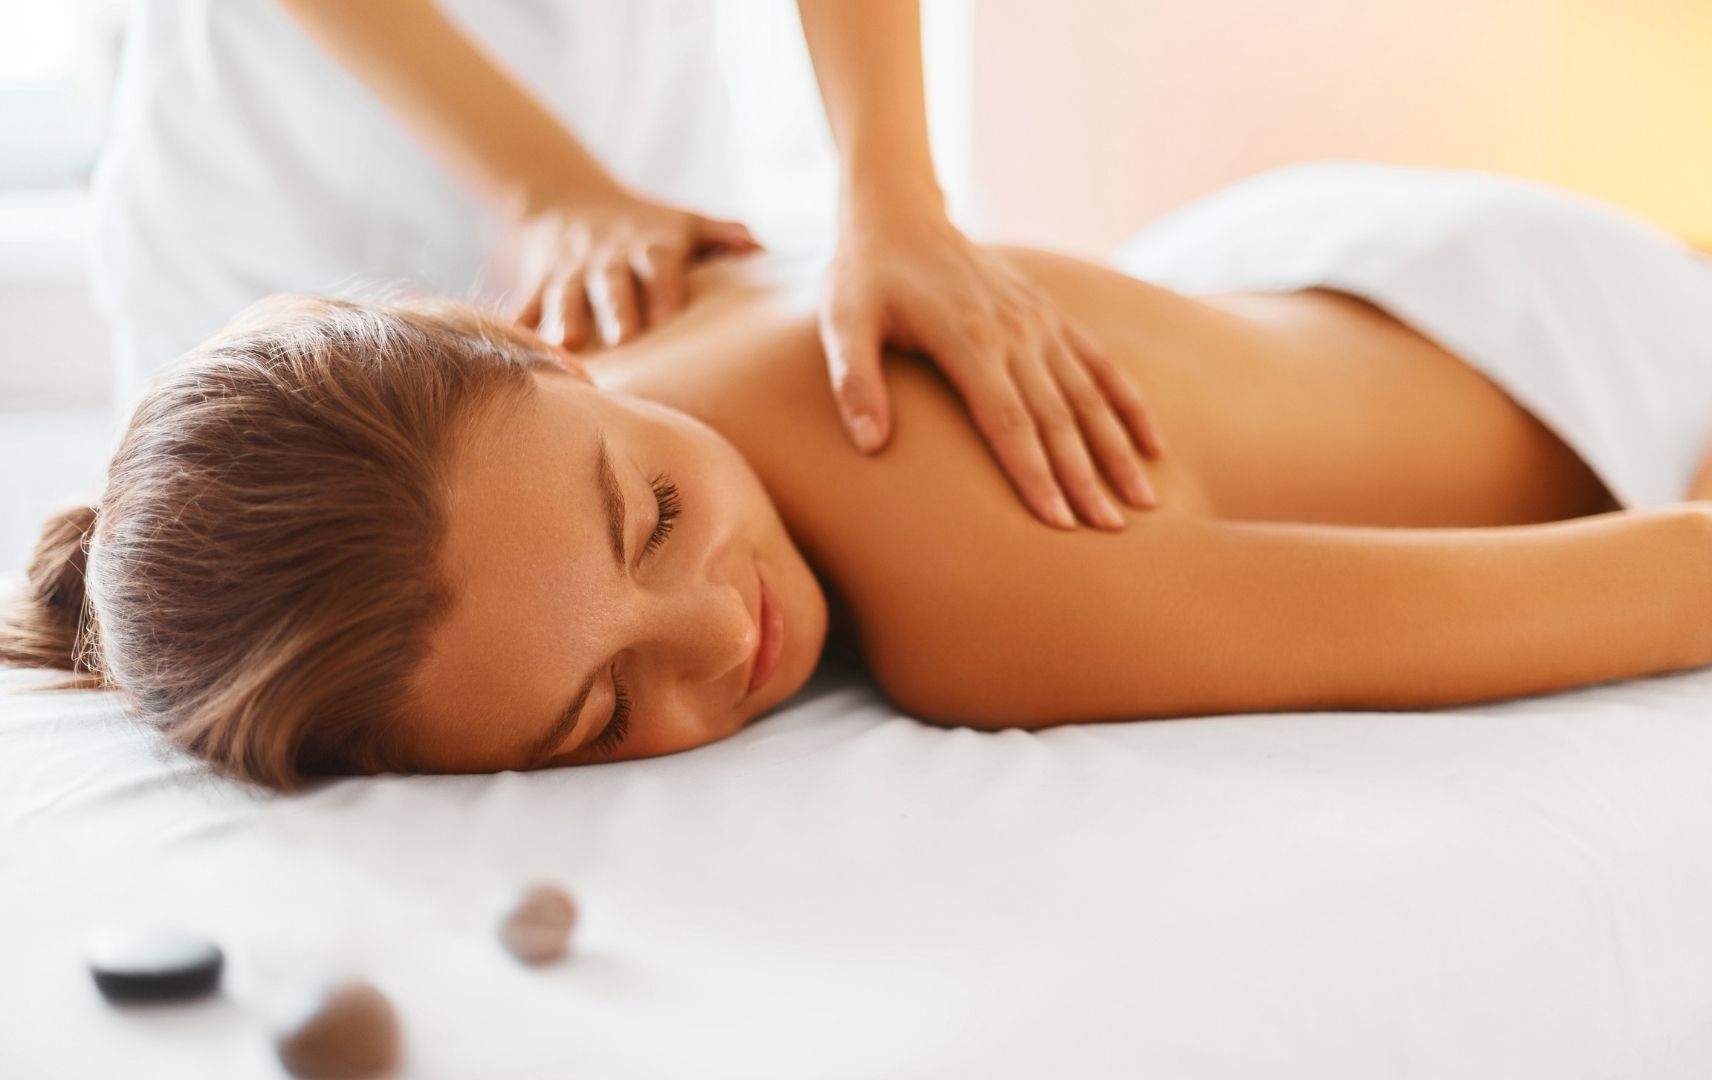 Kreuzfahrt - Wellness Massage